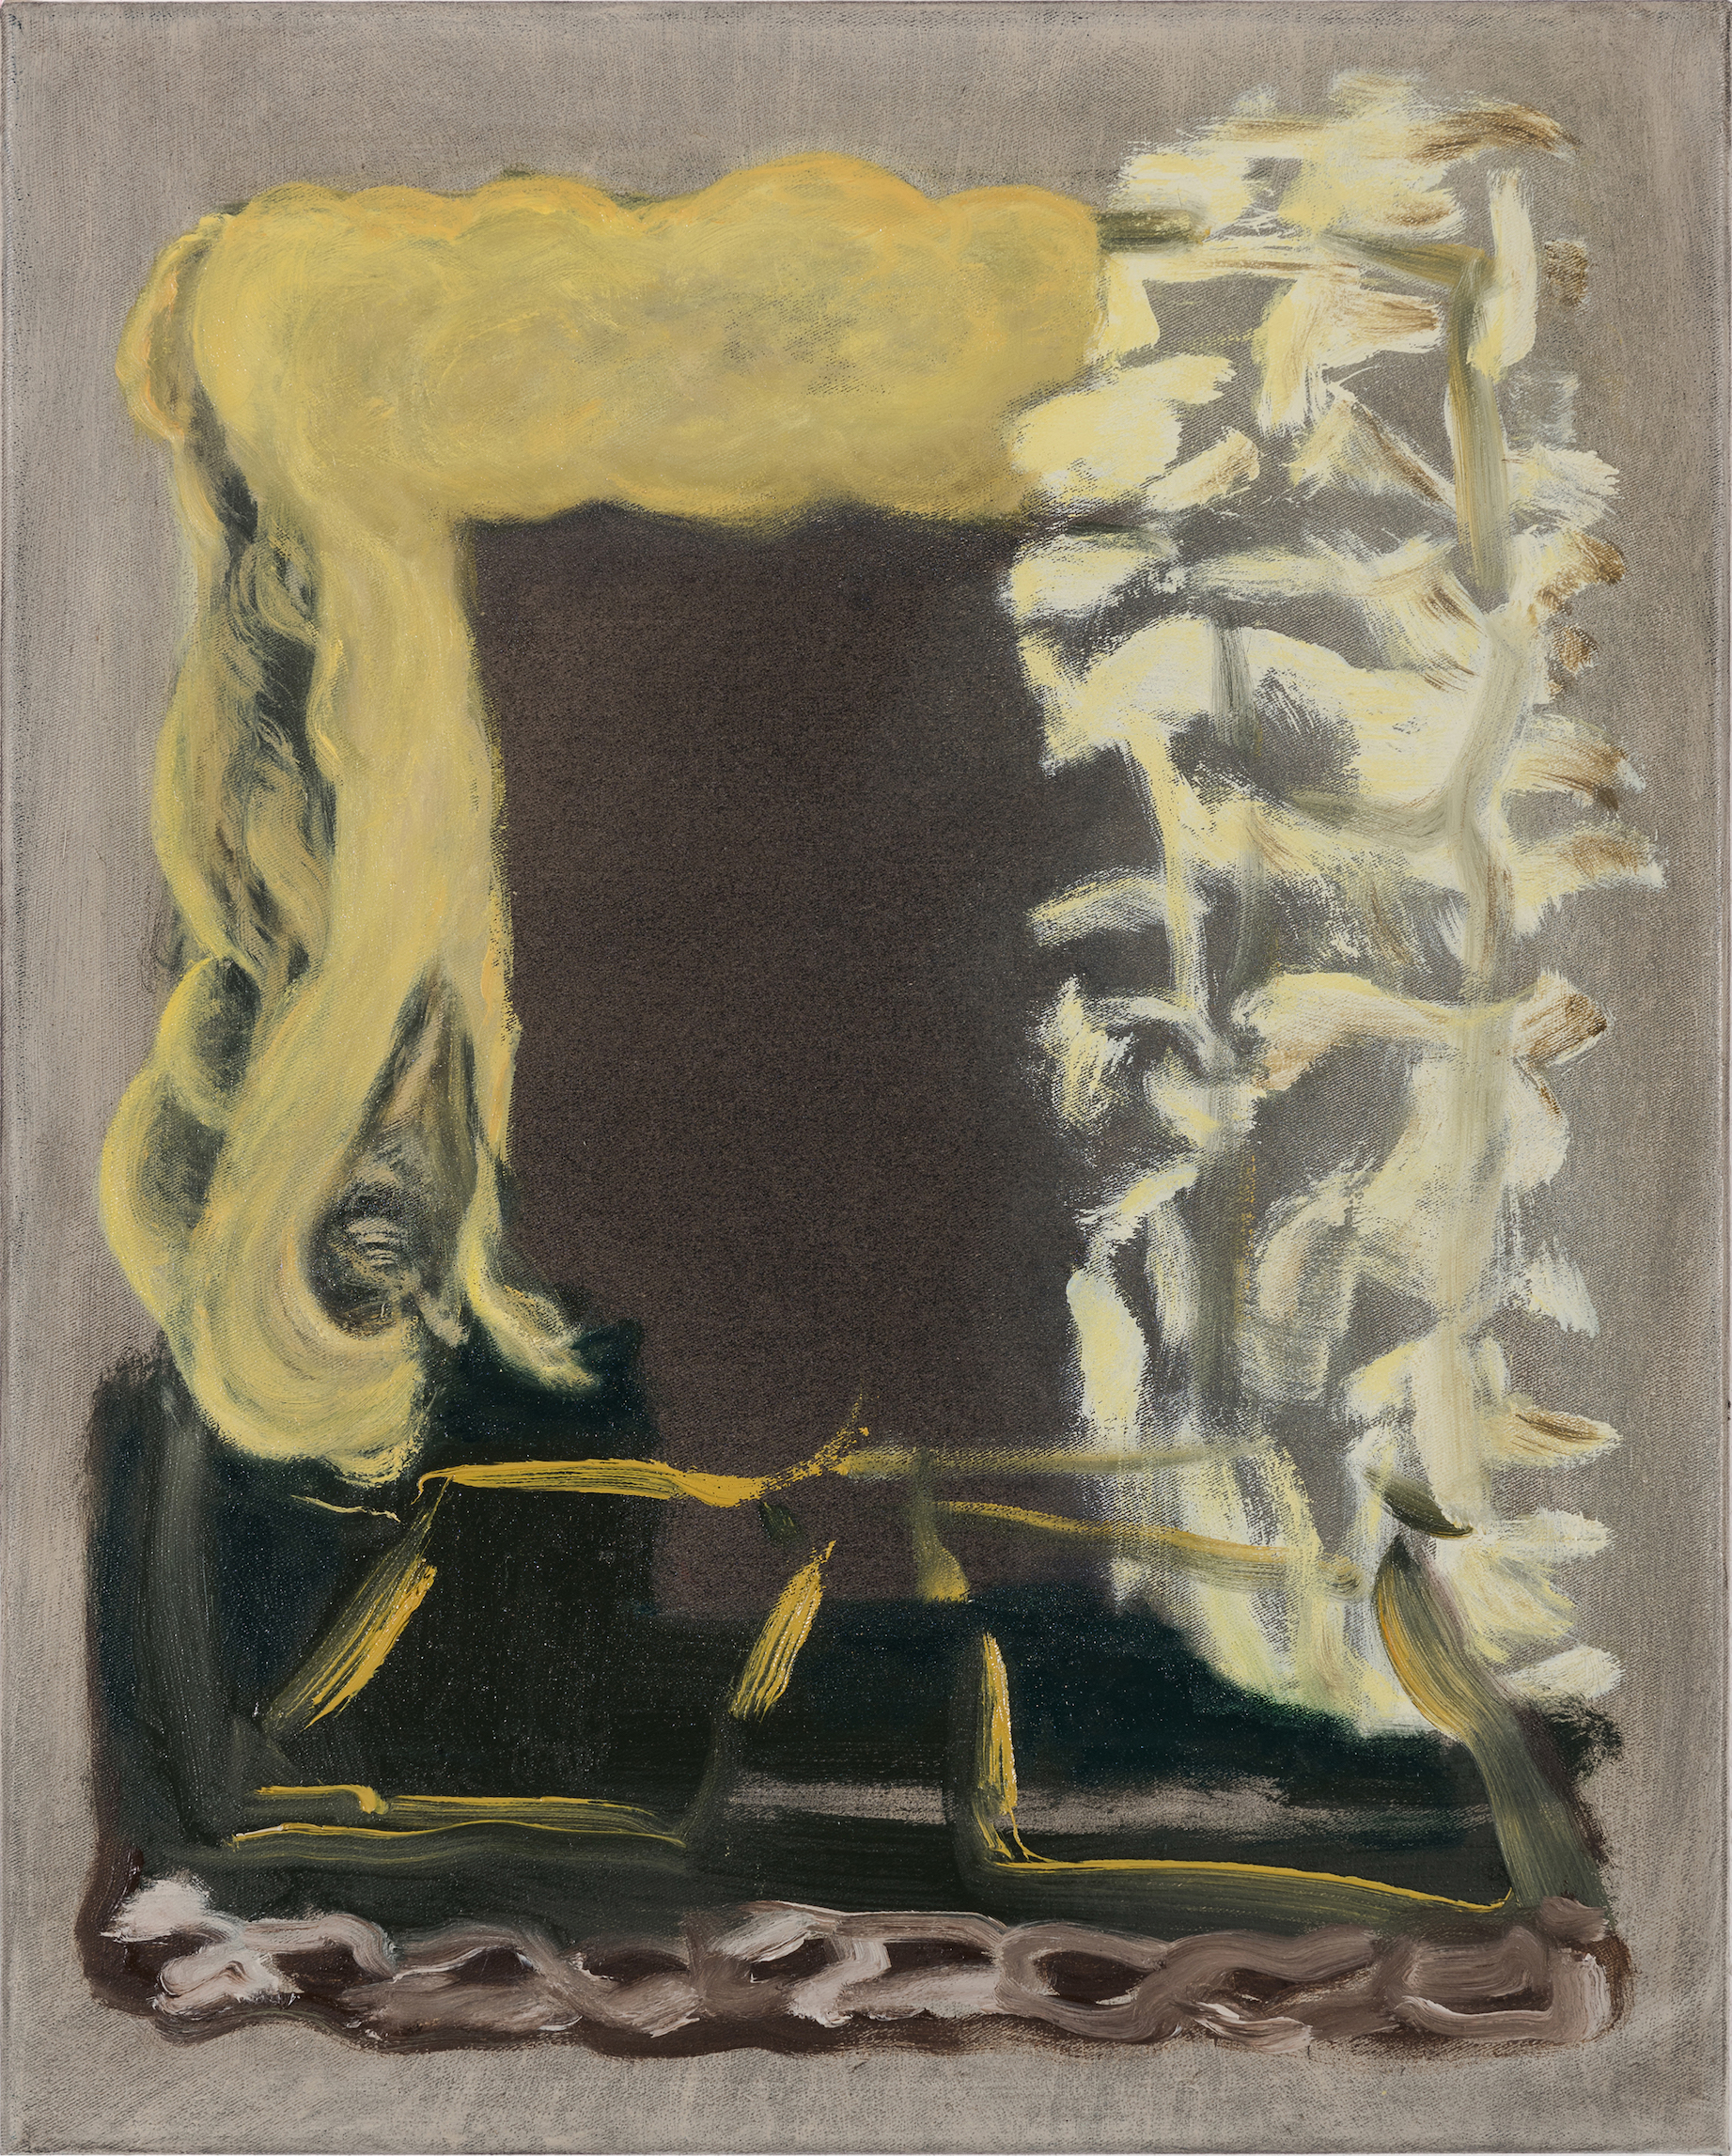 Veronika Hilger, untitled, 2018, oil on canvas, 50 x 40 cm